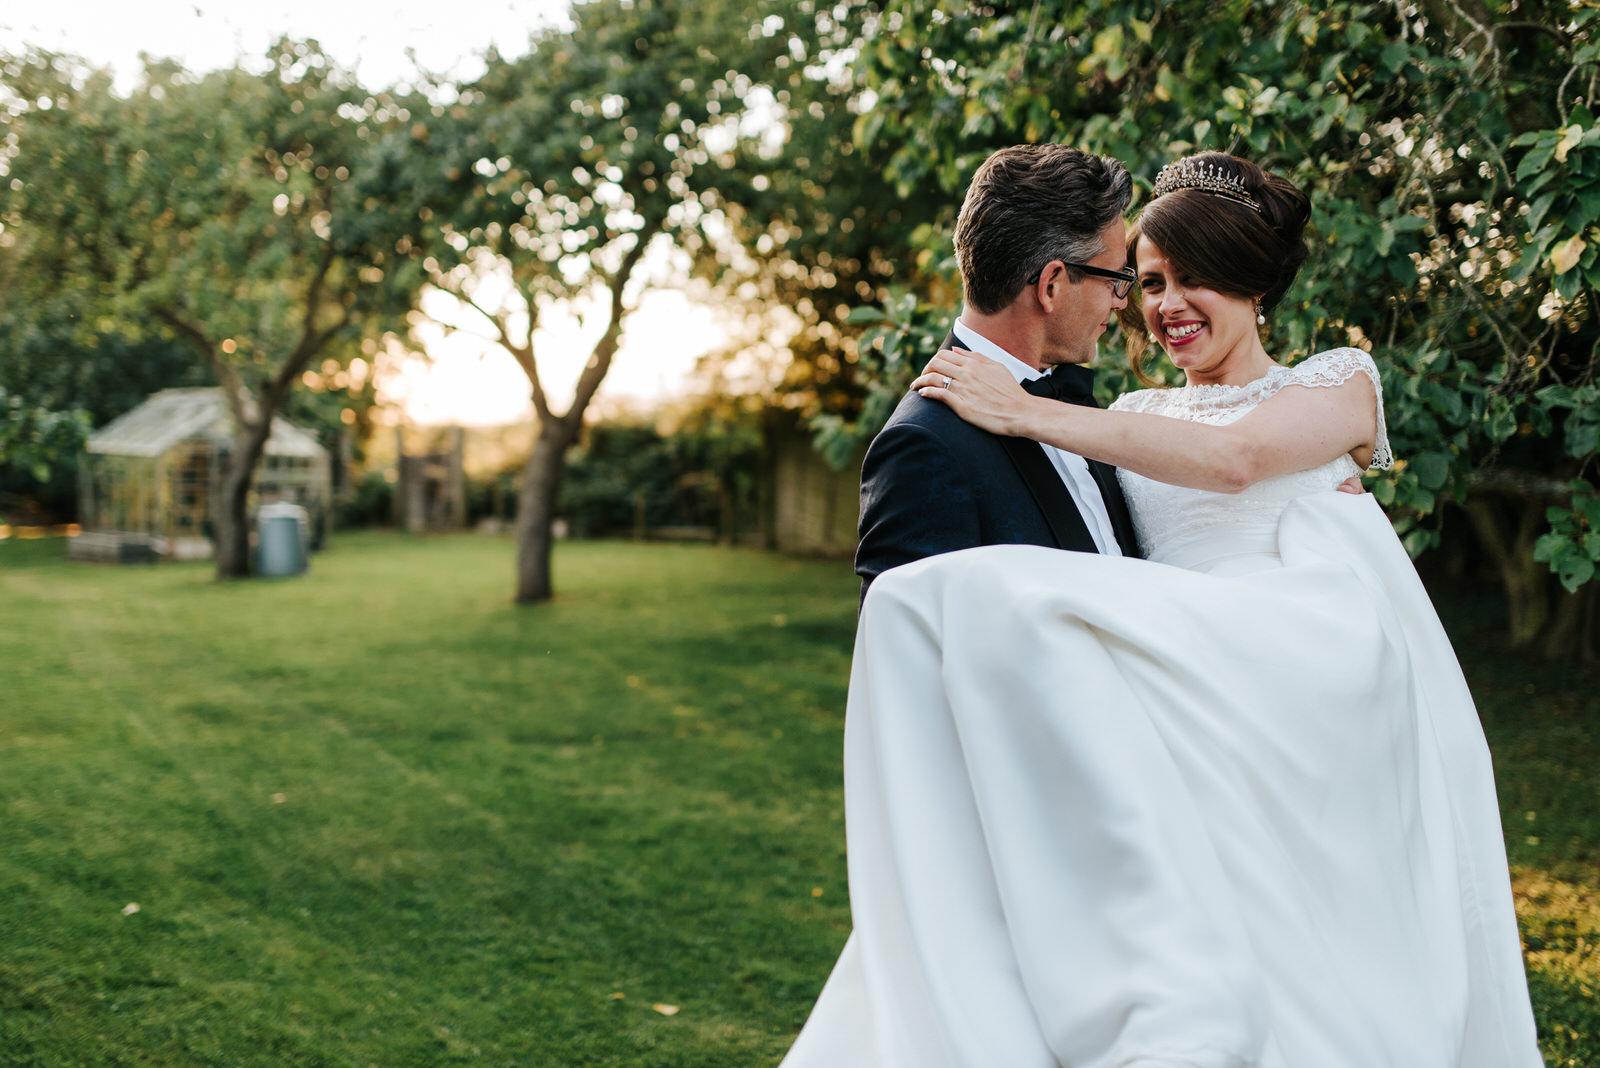 Yorkshire Wedding Photography - Stunning English Garden Marquee Wedding